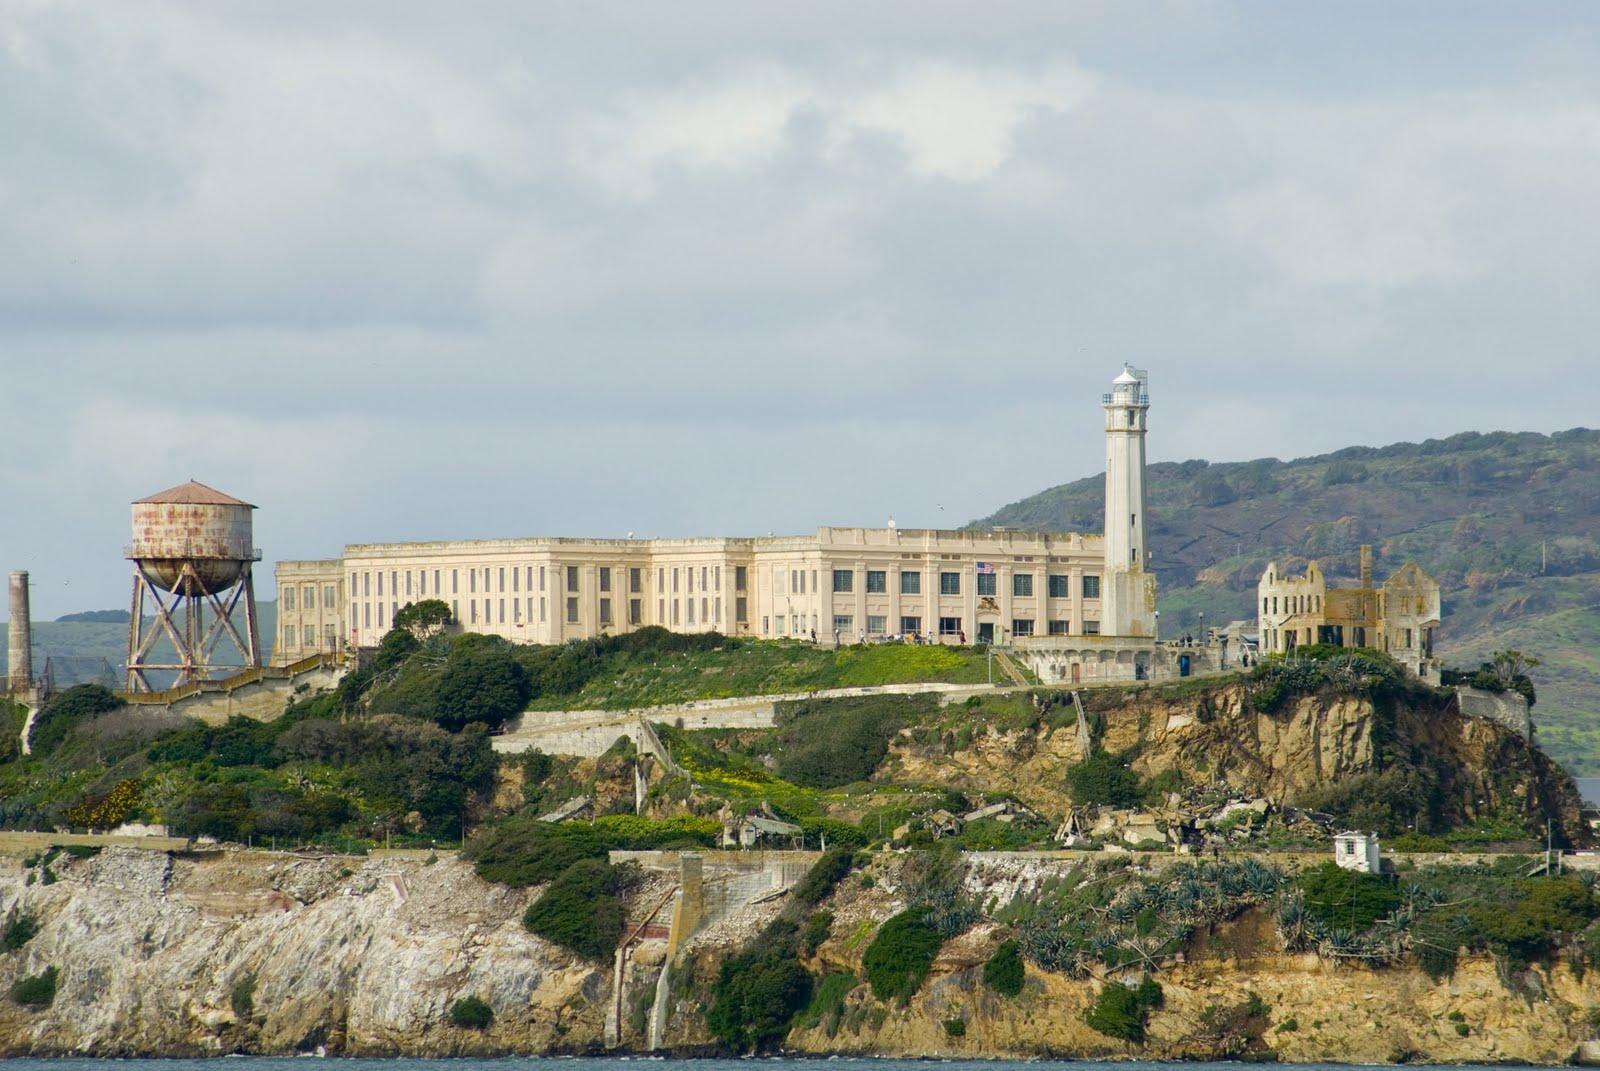 Inside Alcatraz: 44 Historic Photos Of America's Most Notorious Prison